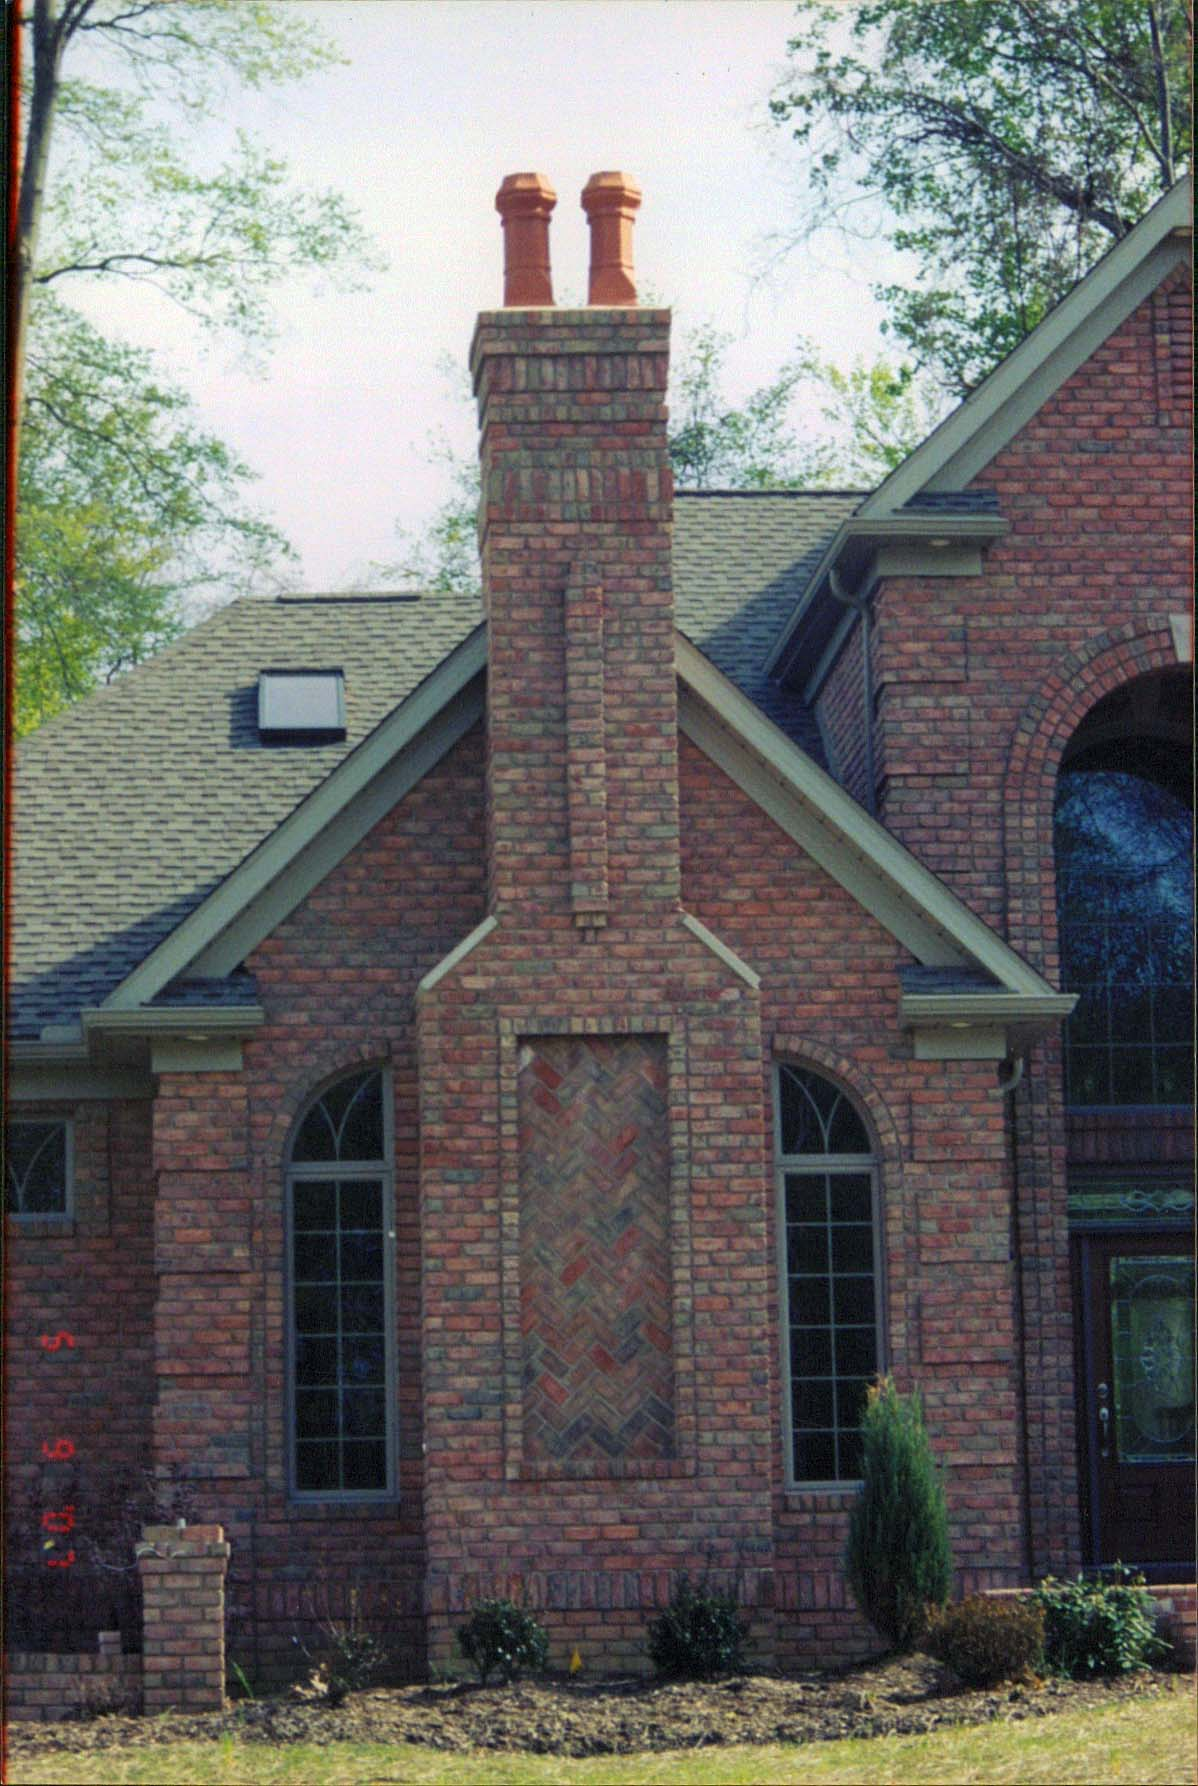 Chimney With Herring Bone Pattern Danish Brick Yoder